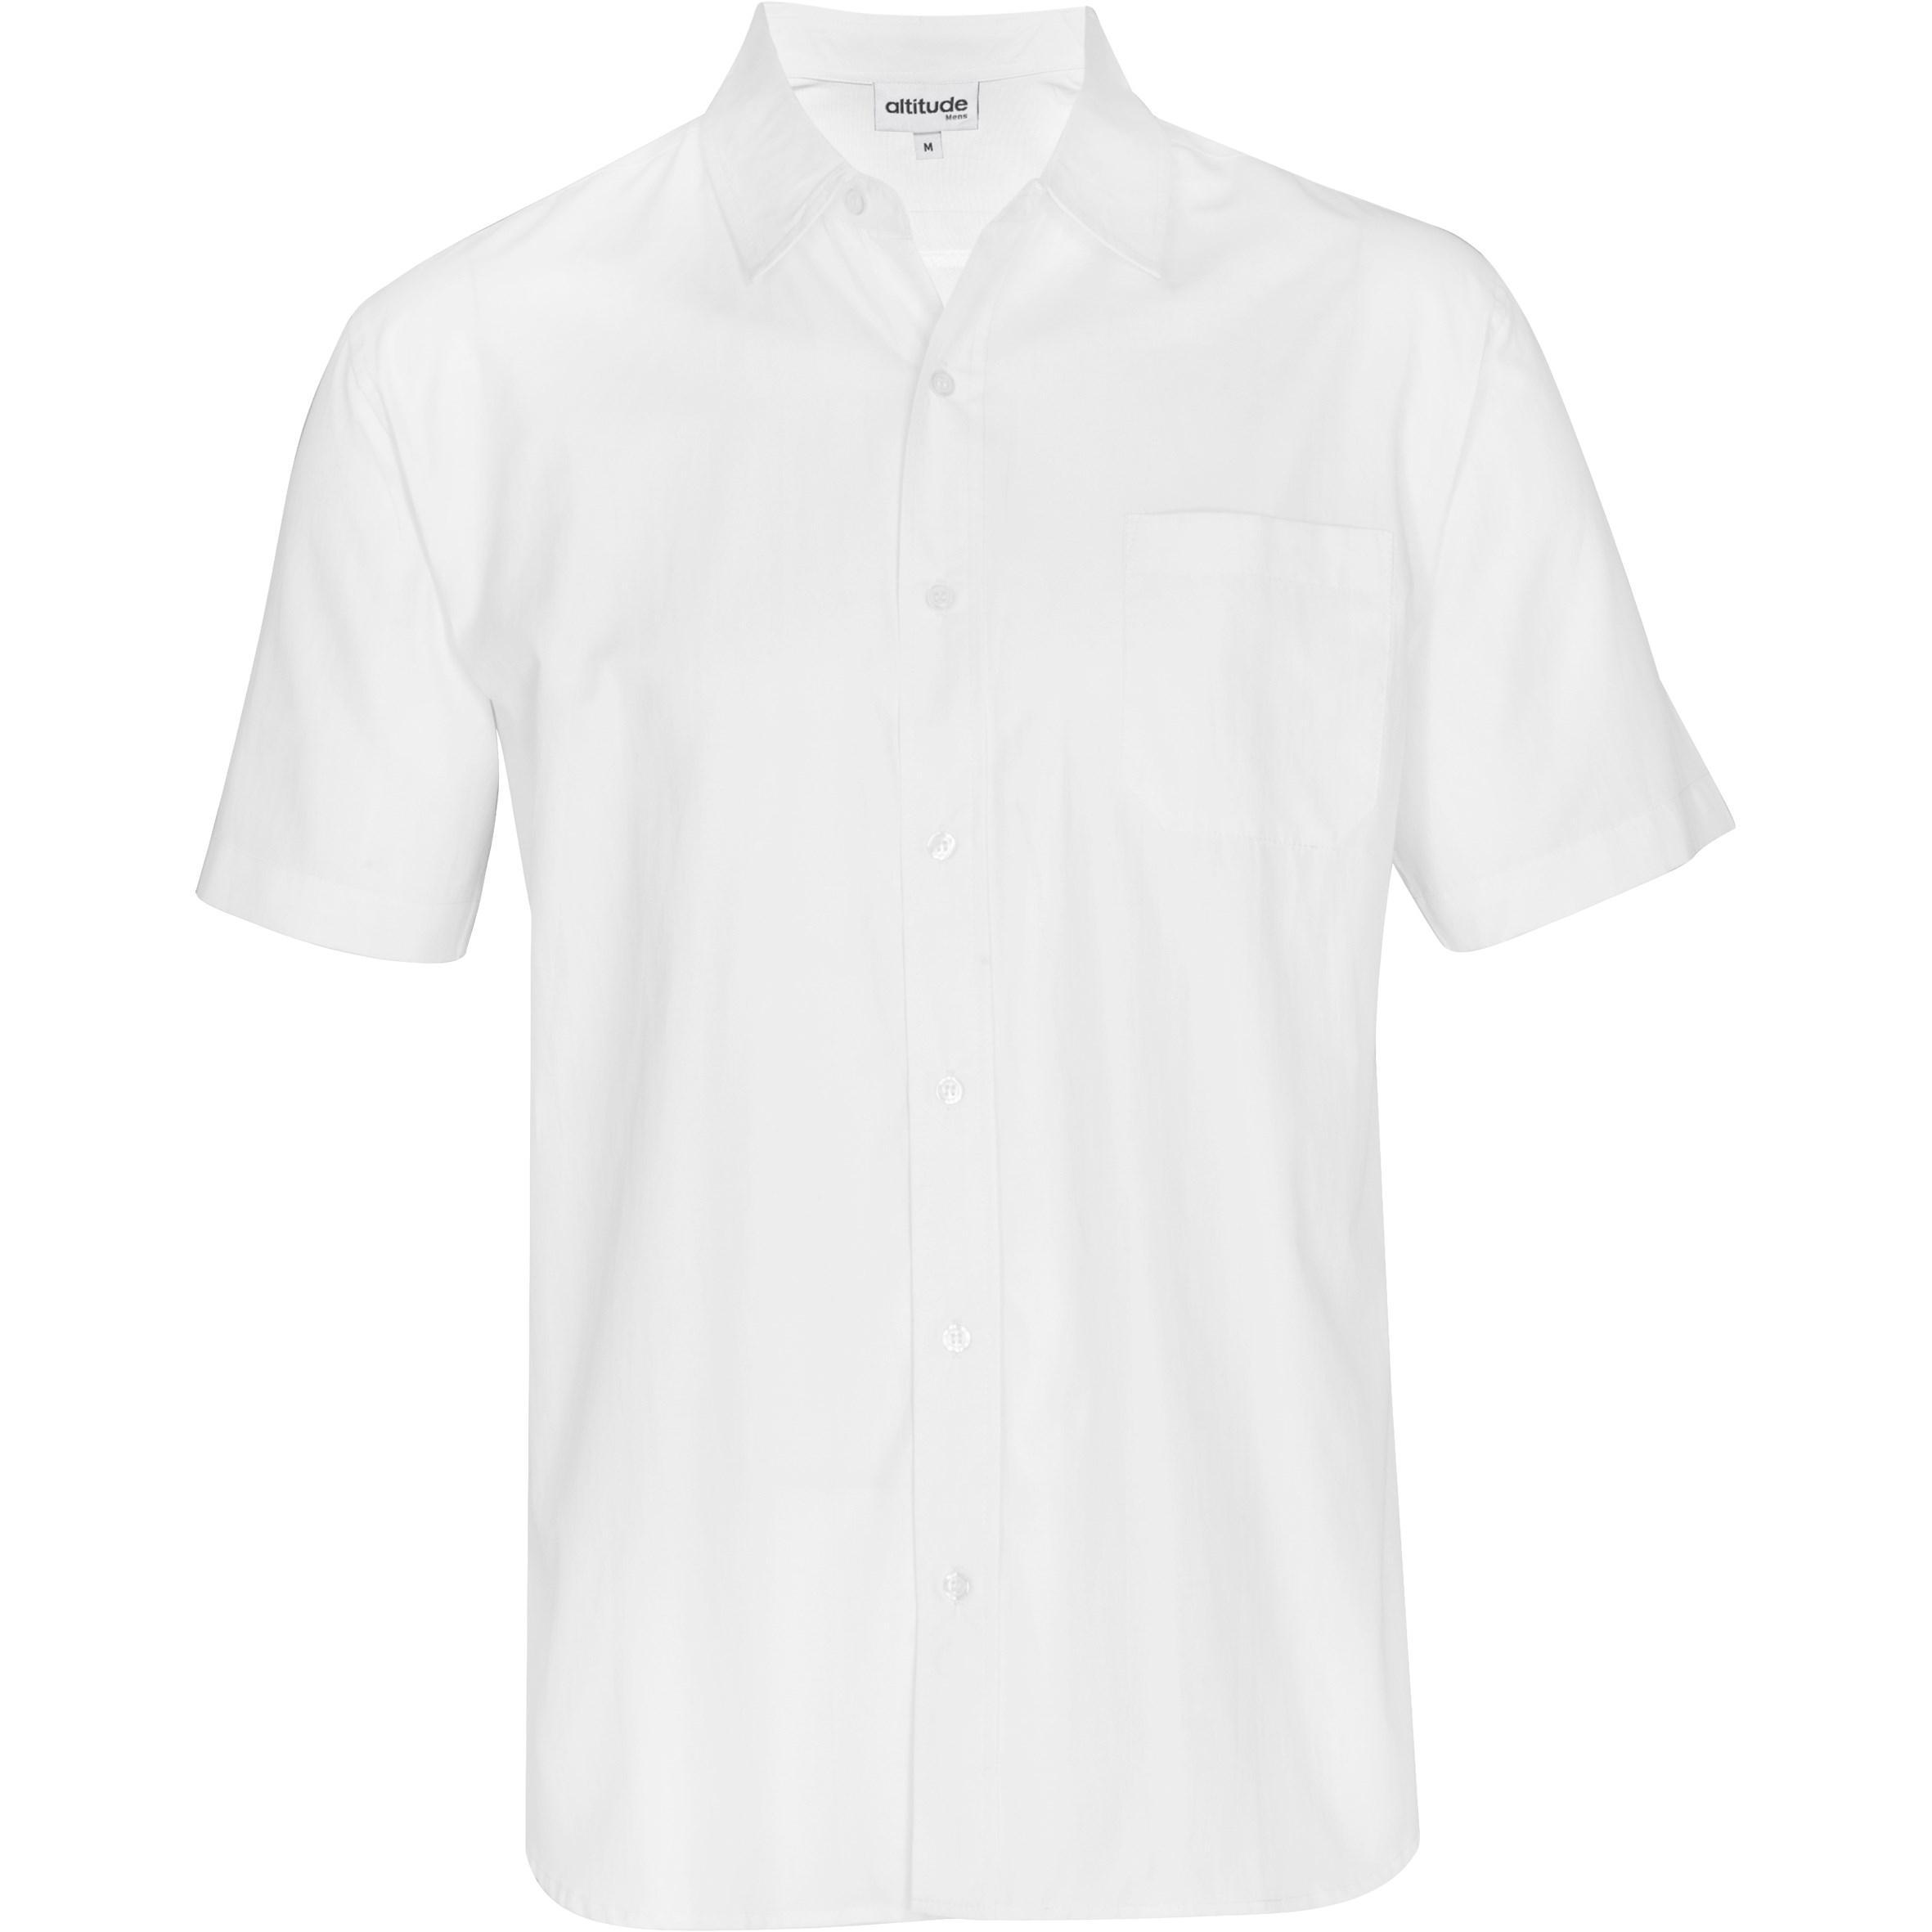 Mens Short Sleeve Catalyst Shirt -white Only